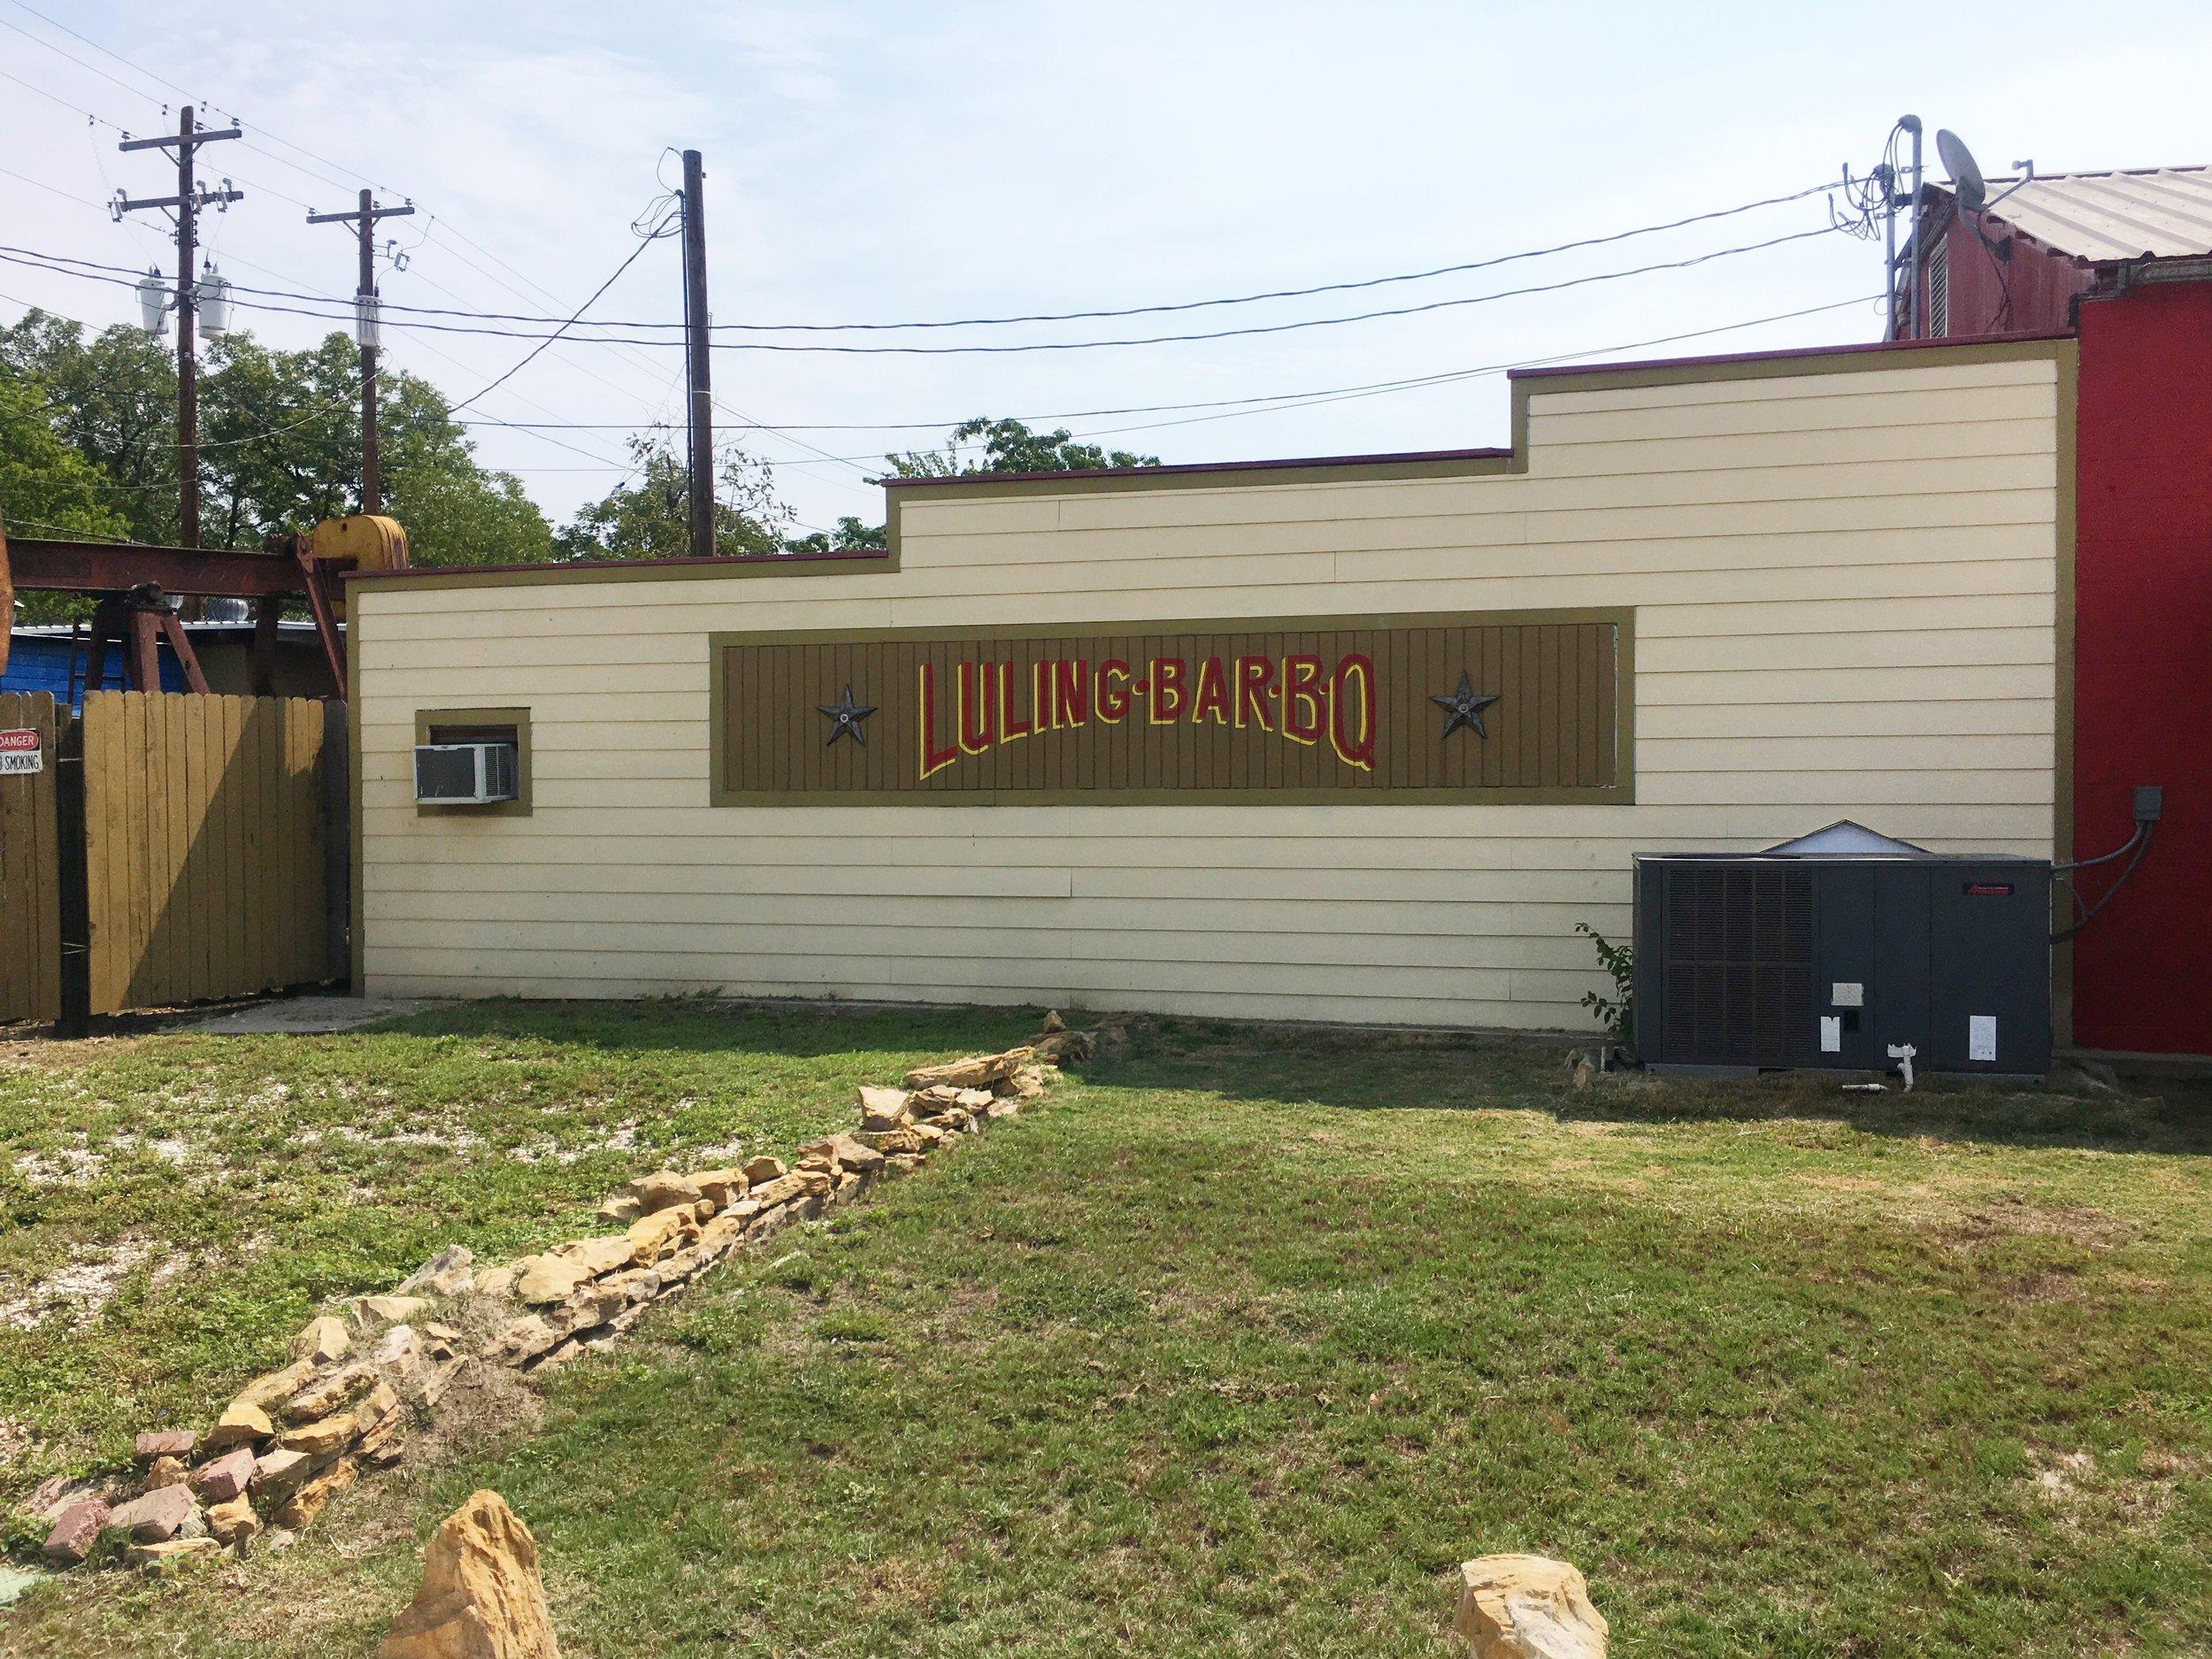 Luling Texas (3).JPG